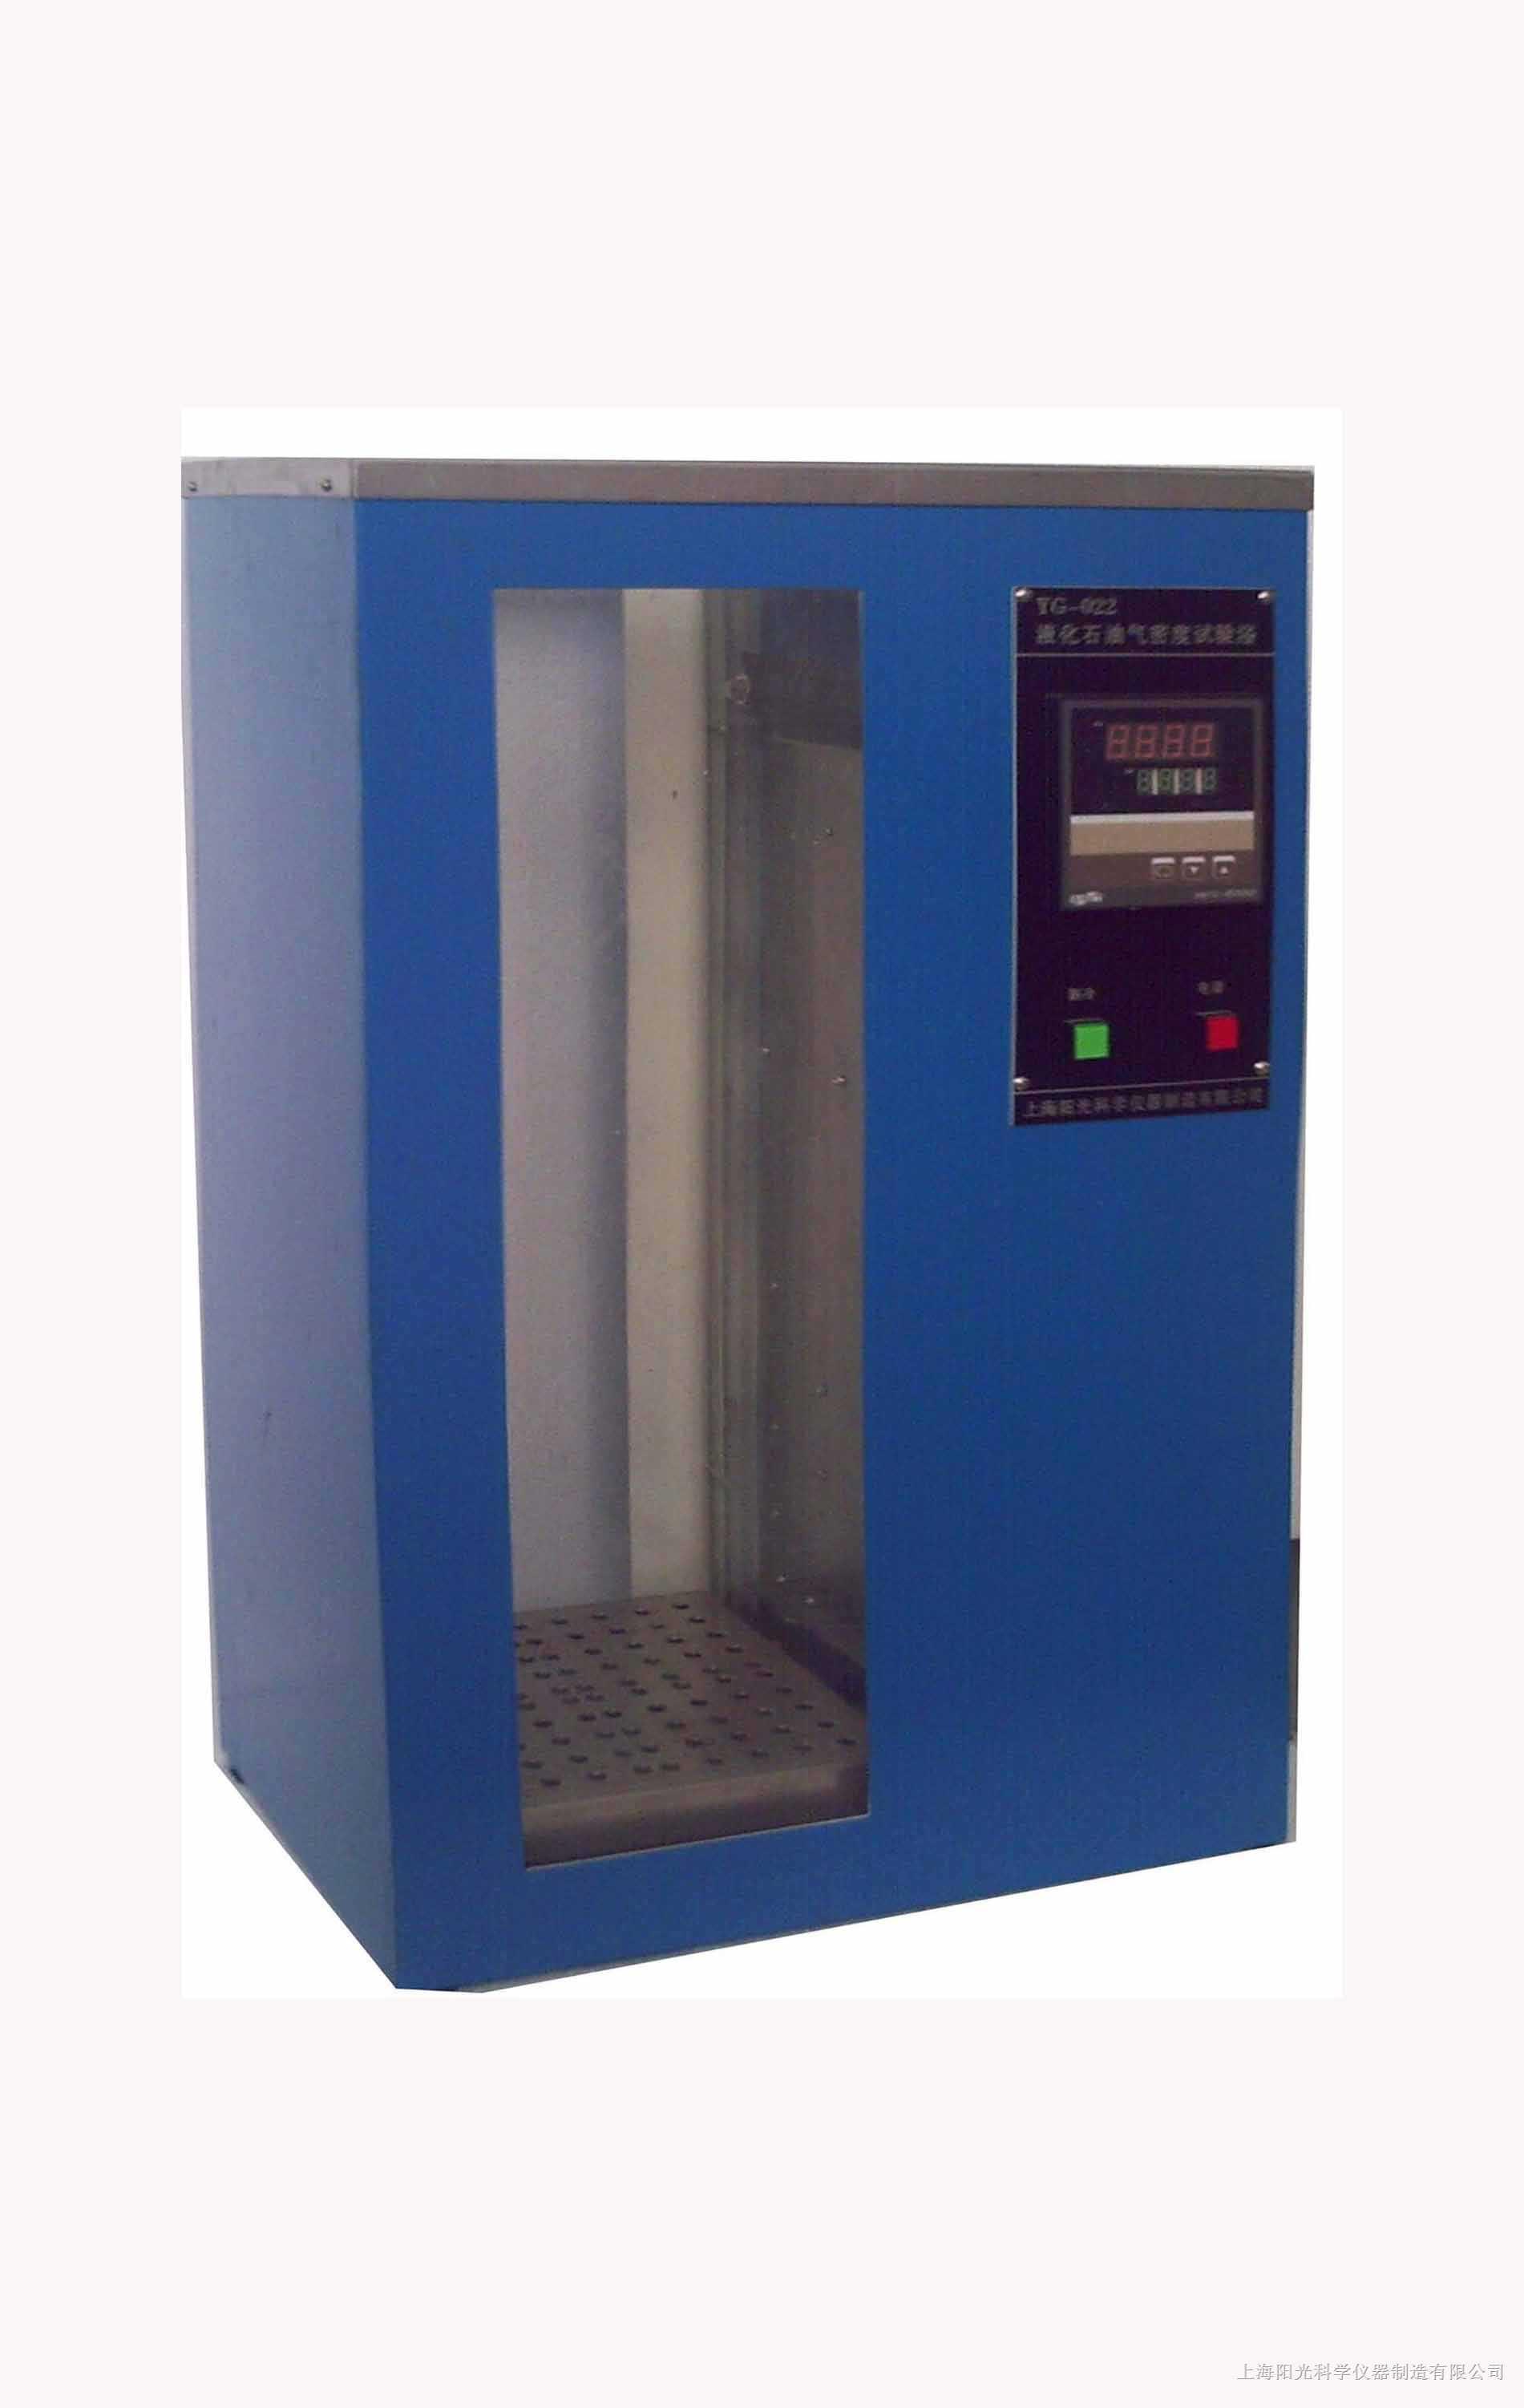 YG-022液化石油气密度试验仪